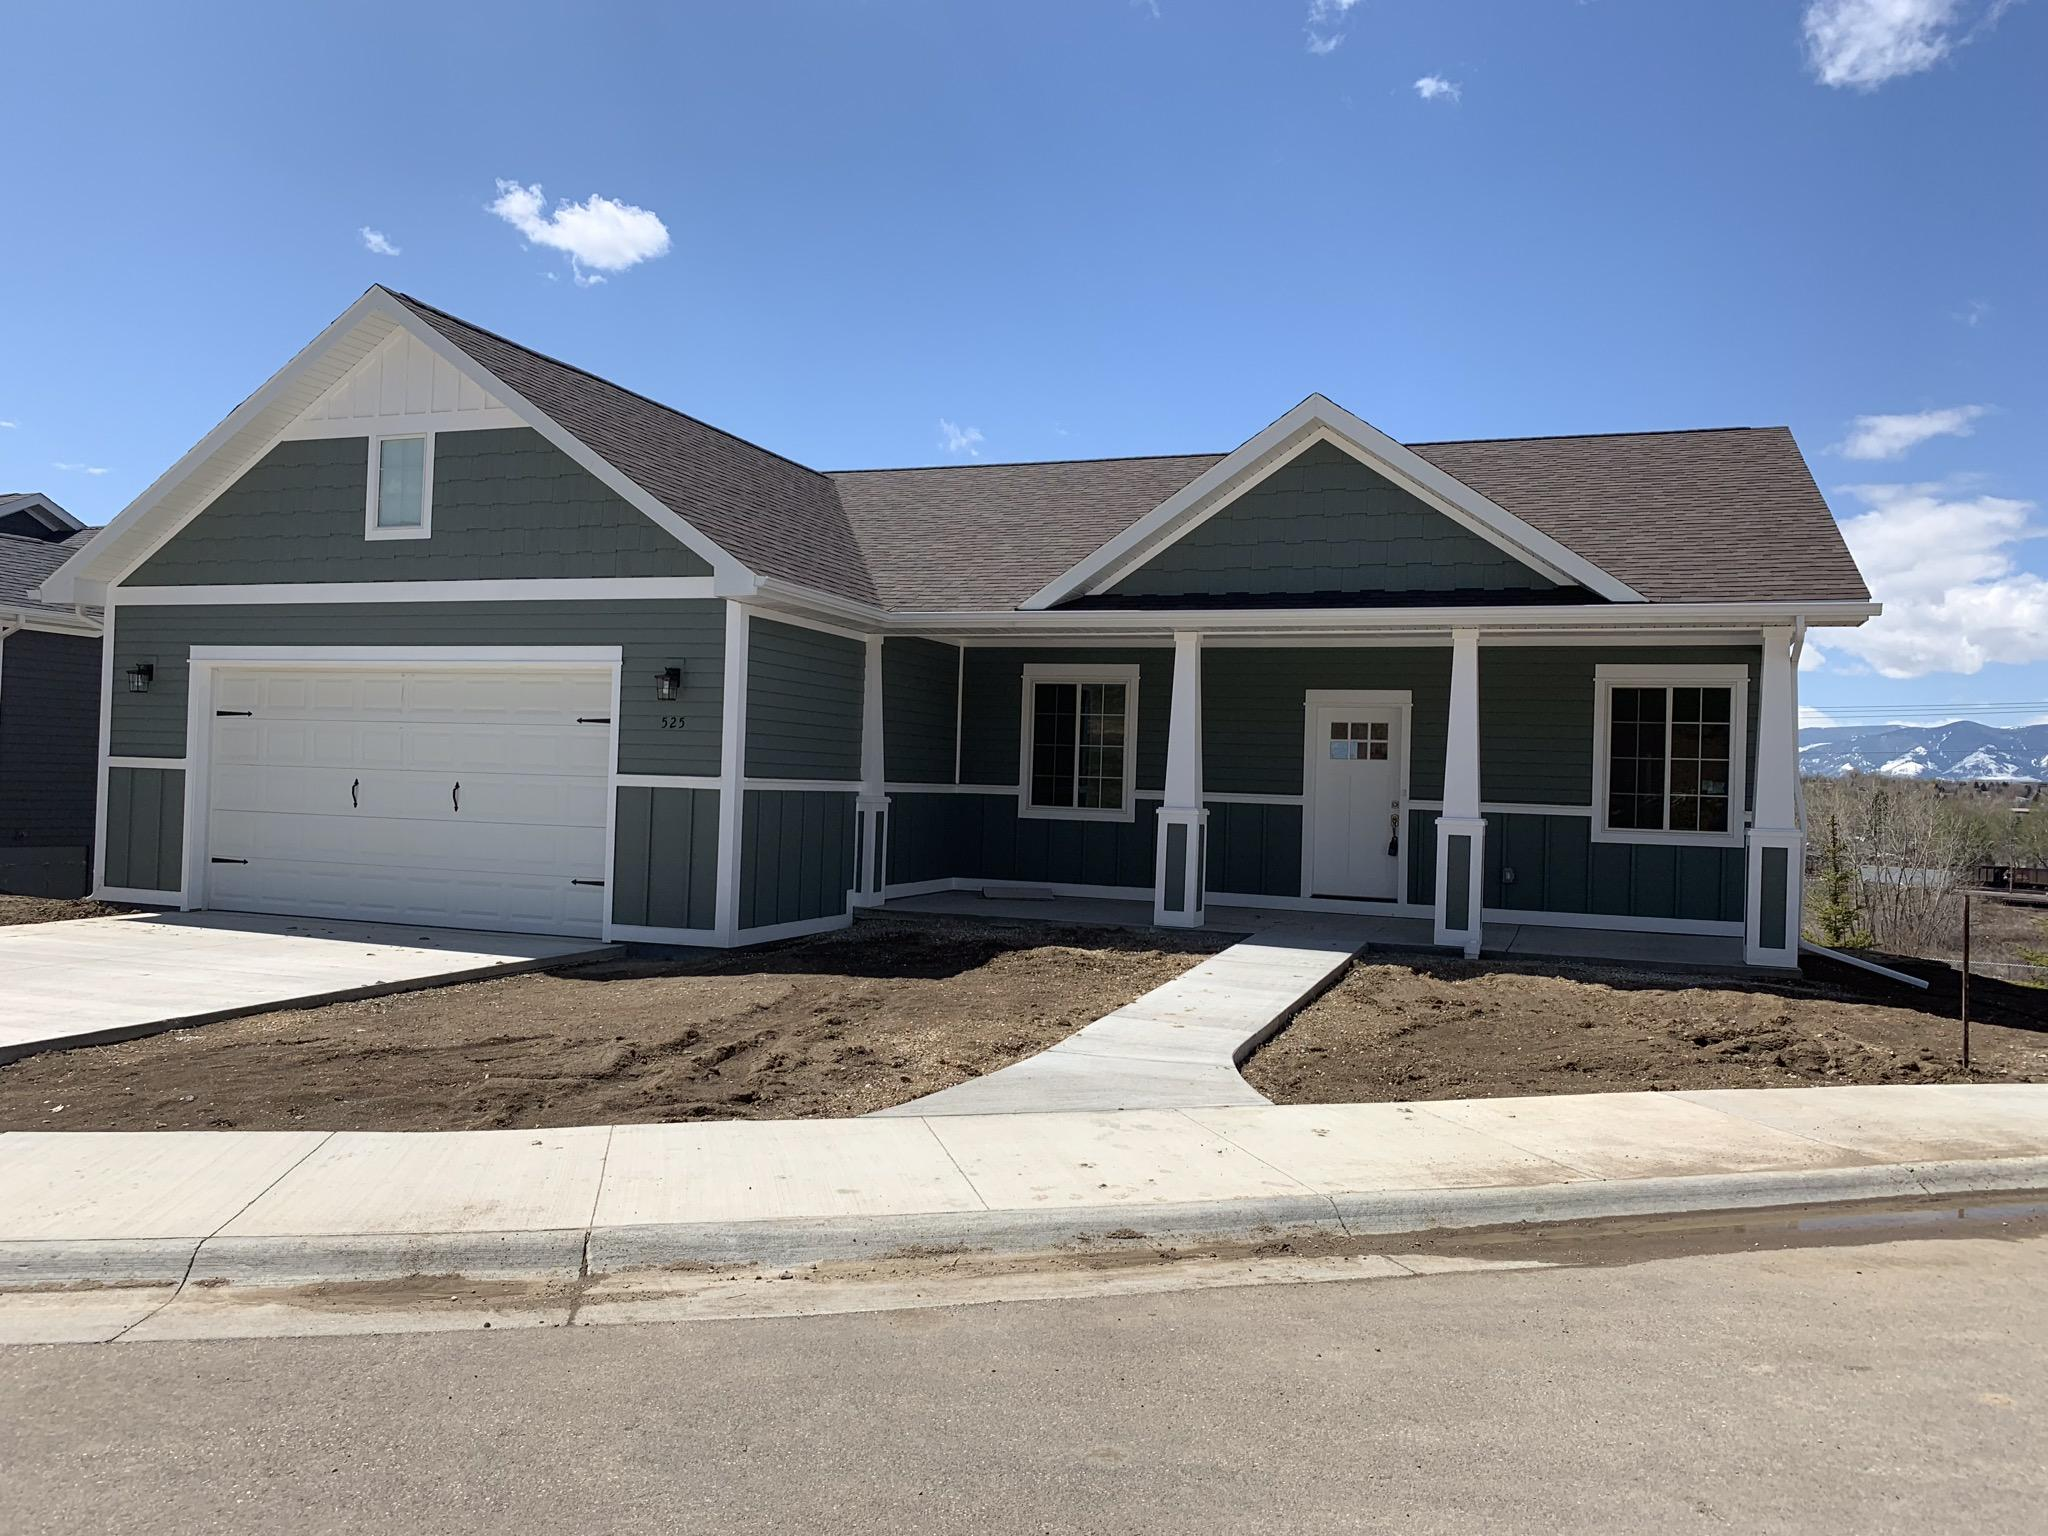 525 Aspen Trail, Sheridan, Wyoming 82801, 3 Bedrooms Bedrooms, ,2 BathroomsBathrooms,Residential,For Sale,Aspen,18-1207